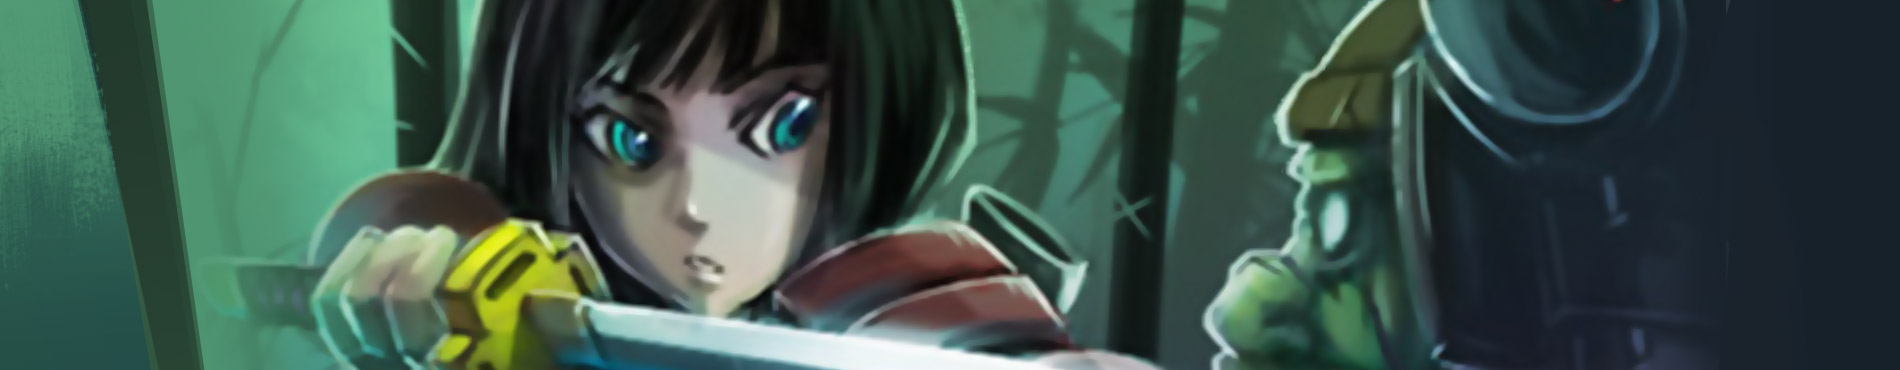 Samurai sword destiny_Banner